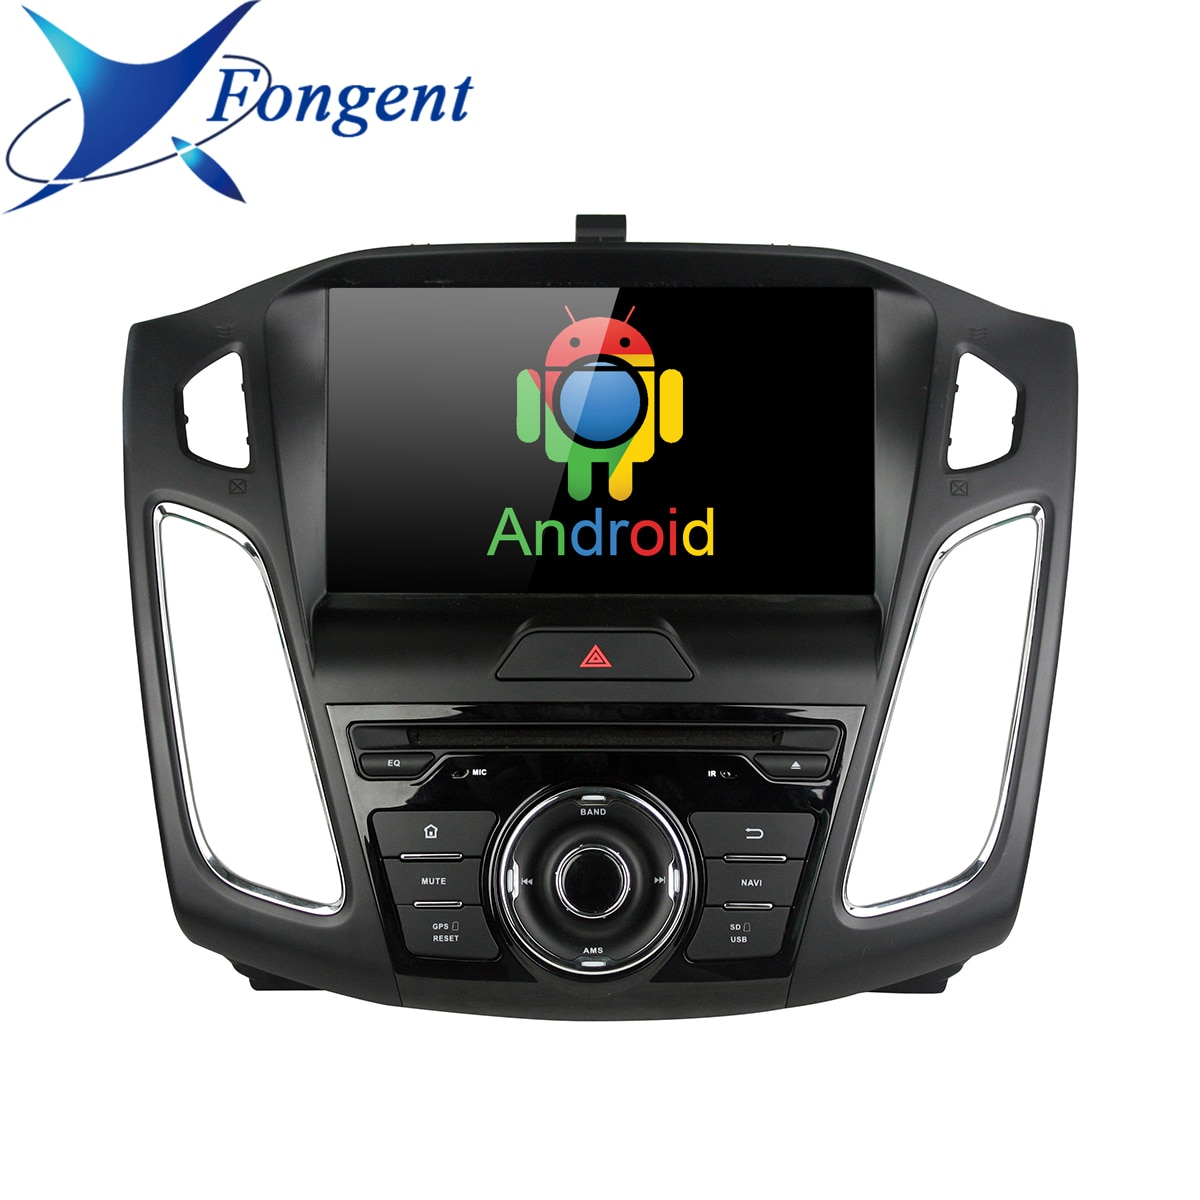 "9 ""Android 9 GPS para coche estéreo para 2015 de 2016 de 2017 se Auto Radio FM DVD Audio Video WiFi navegación GPS cámara de copia de seguridad 8 Core CPU"